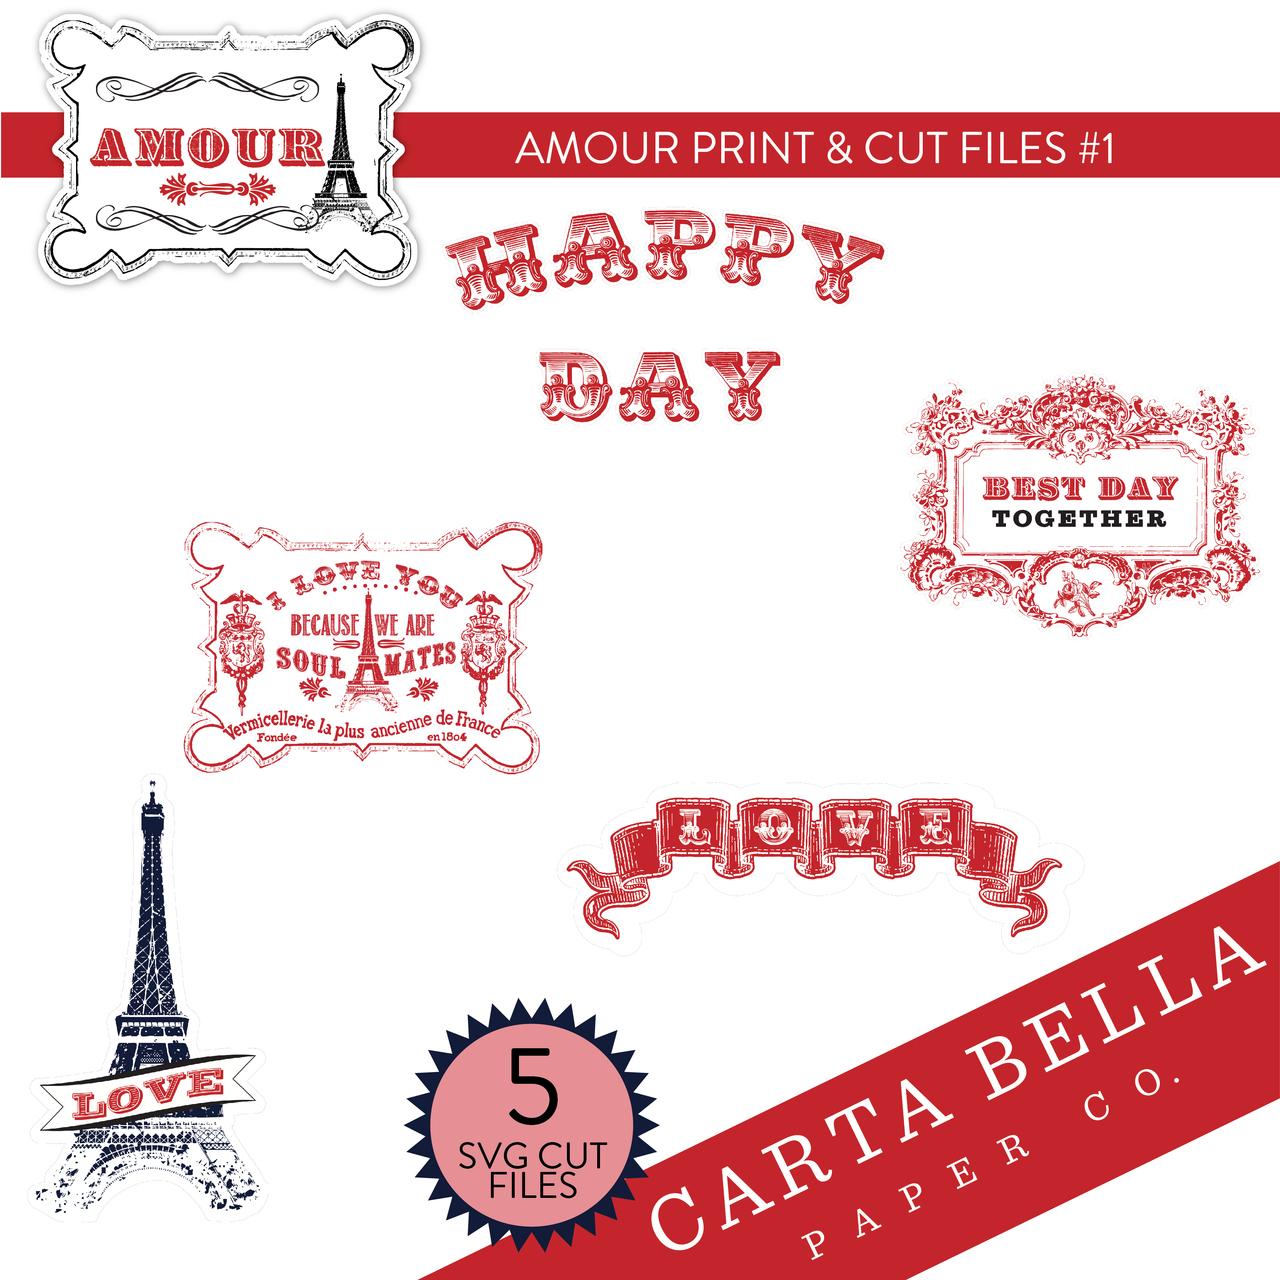 Amour Print & Cut Files #1